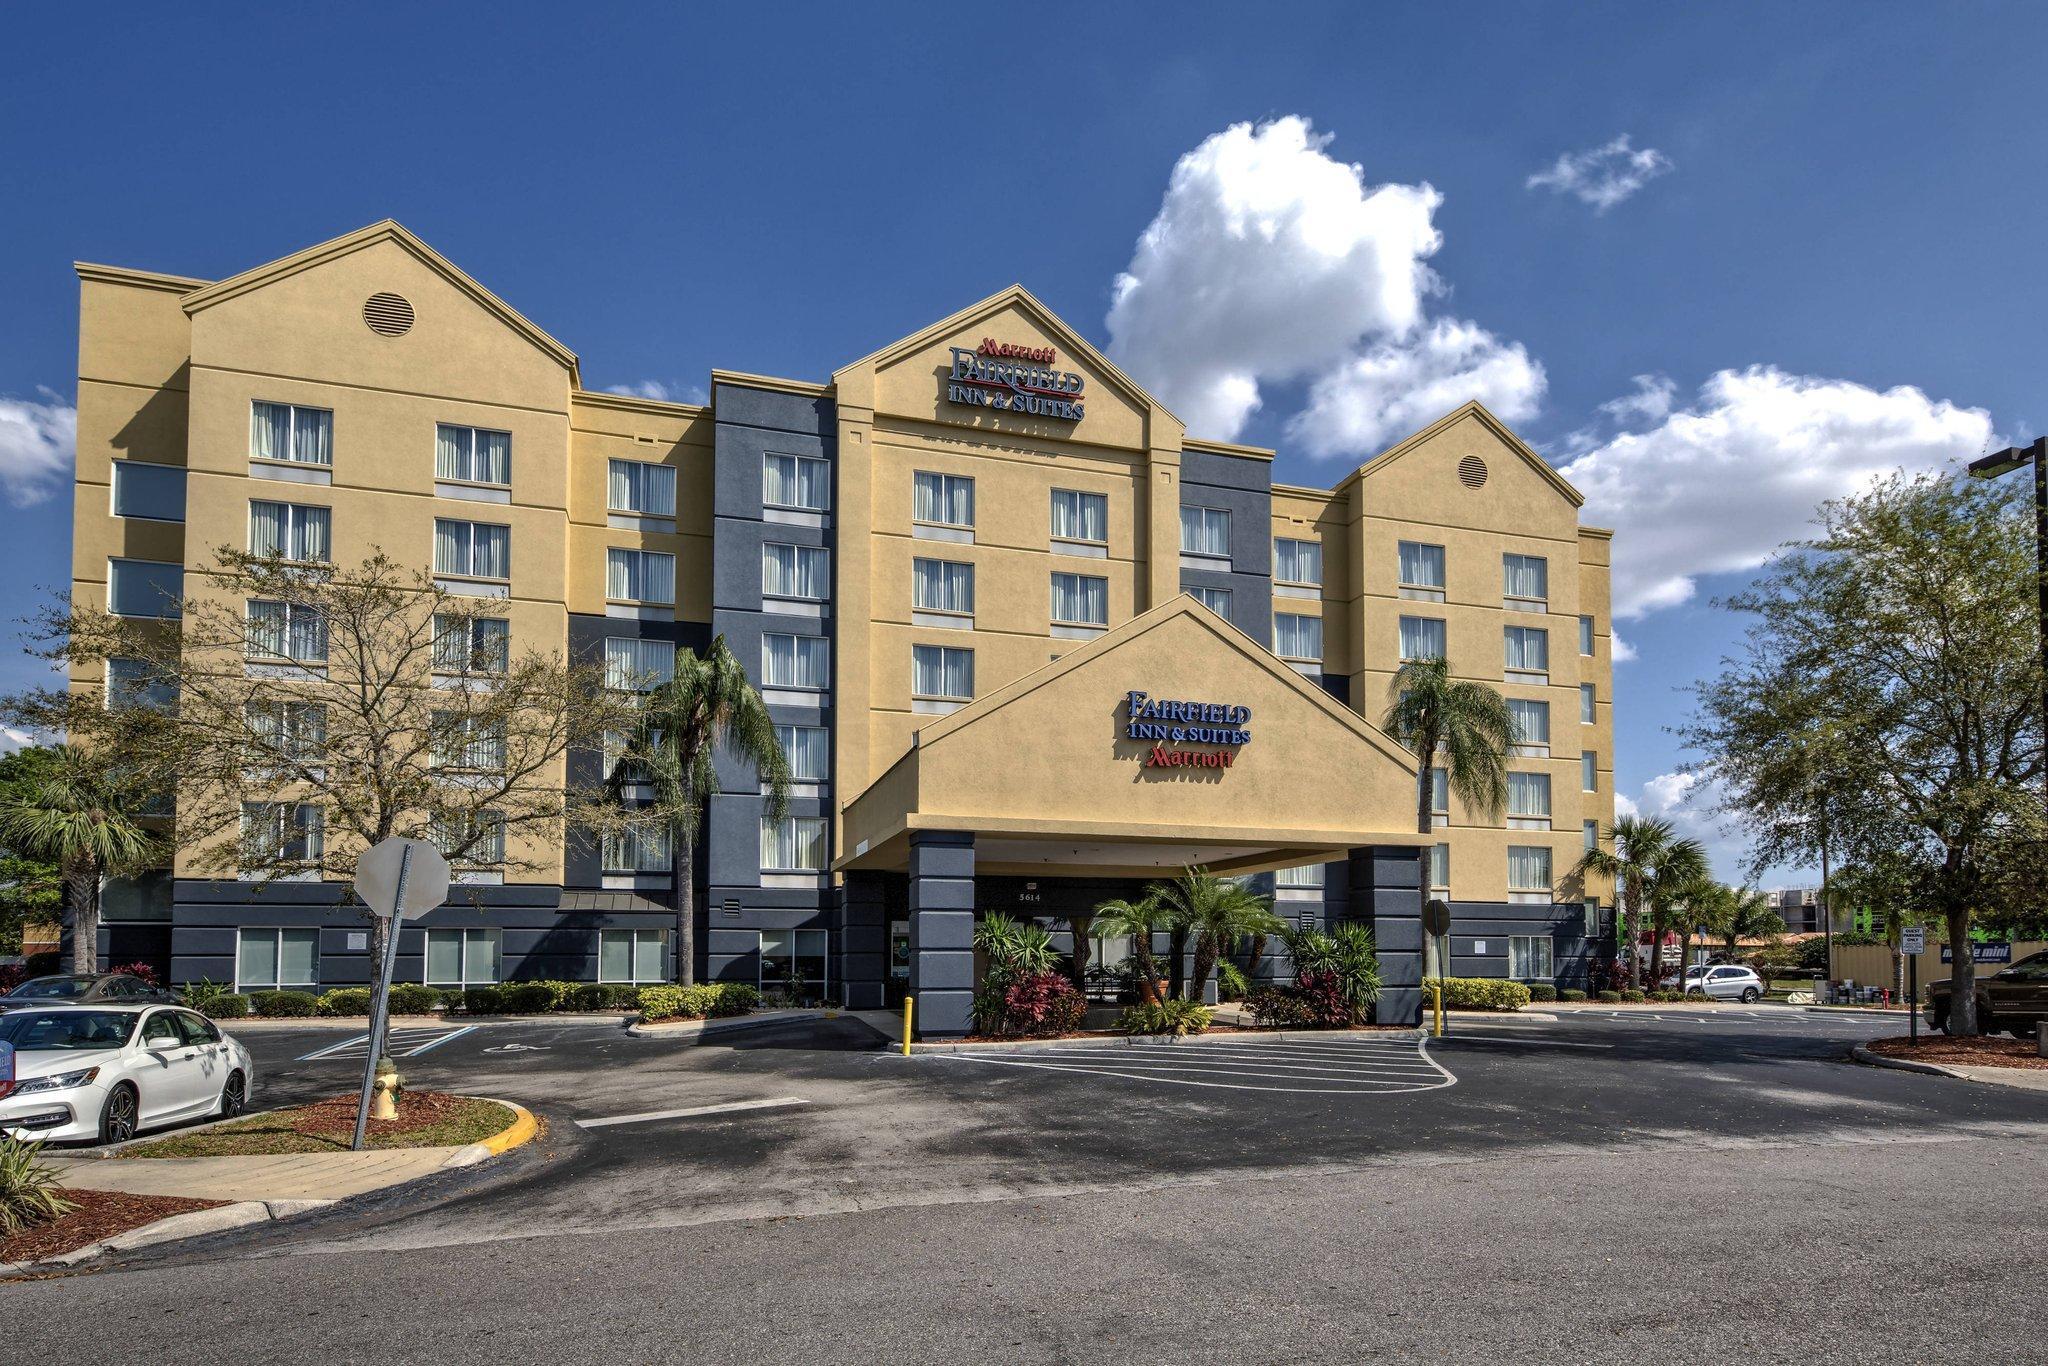 Fairfield Inn And Suites Orlando Near Universal Orlando Resort